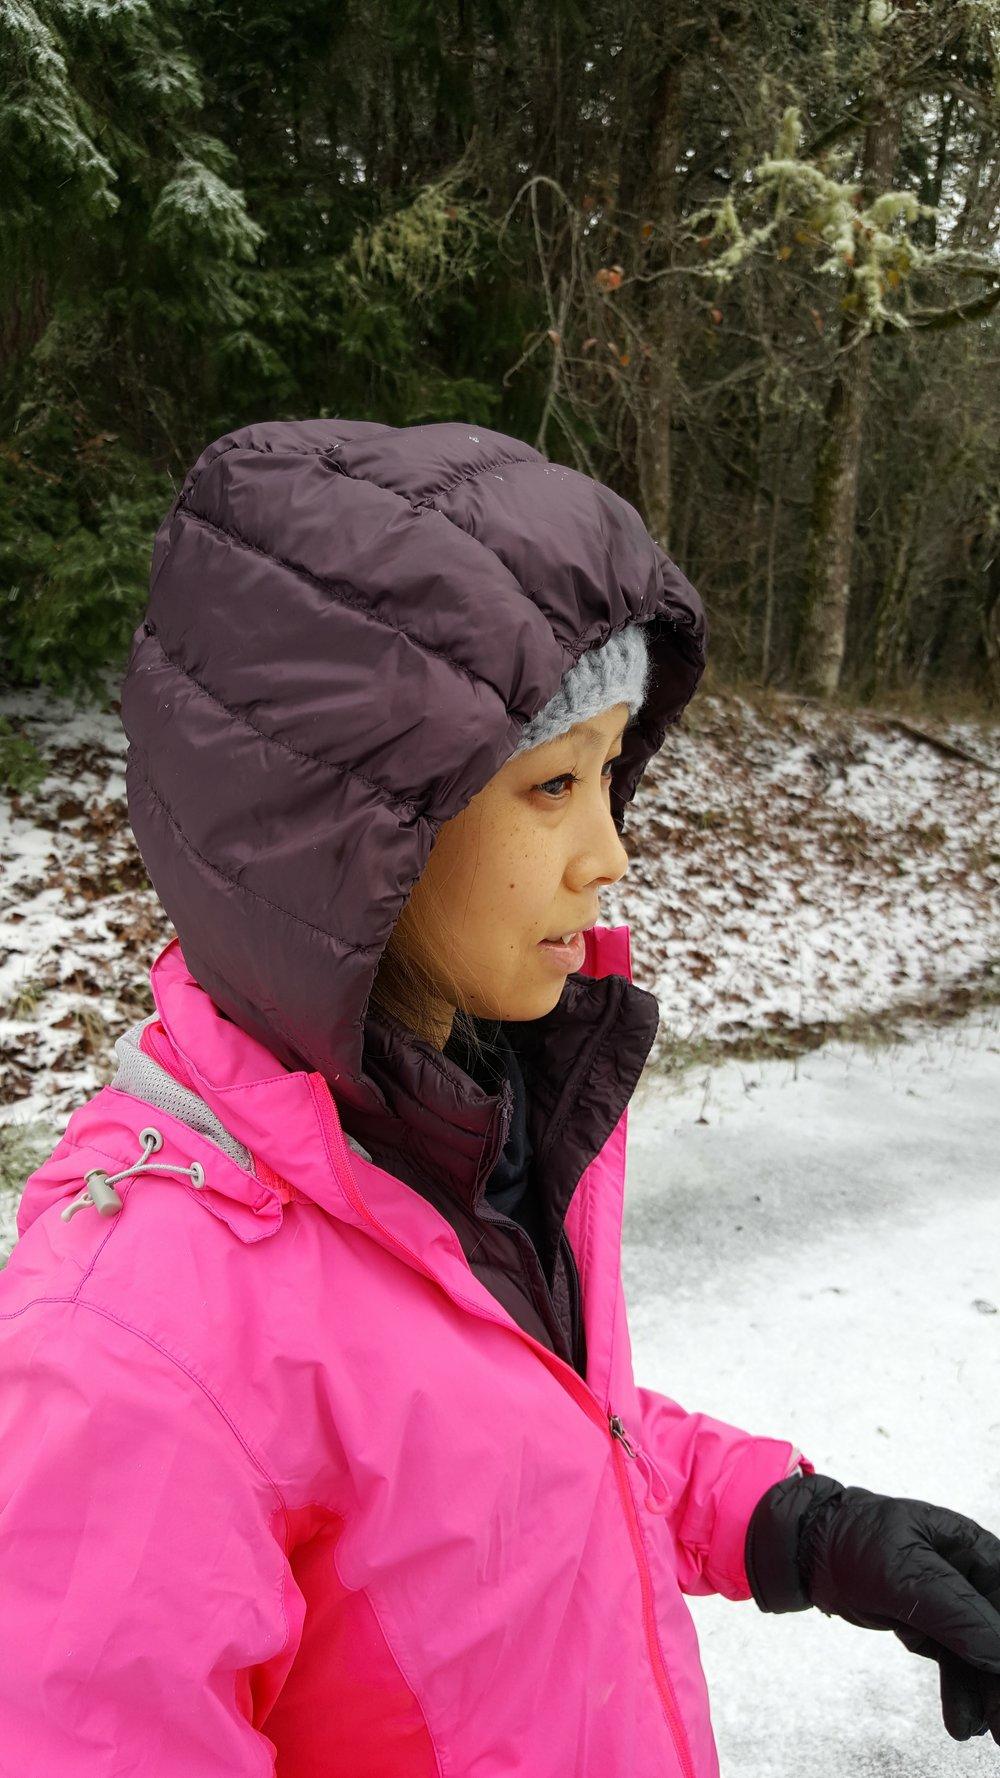 Layers keep me warm on my winter runs- Love this waterproof Road Runner Sports jacket